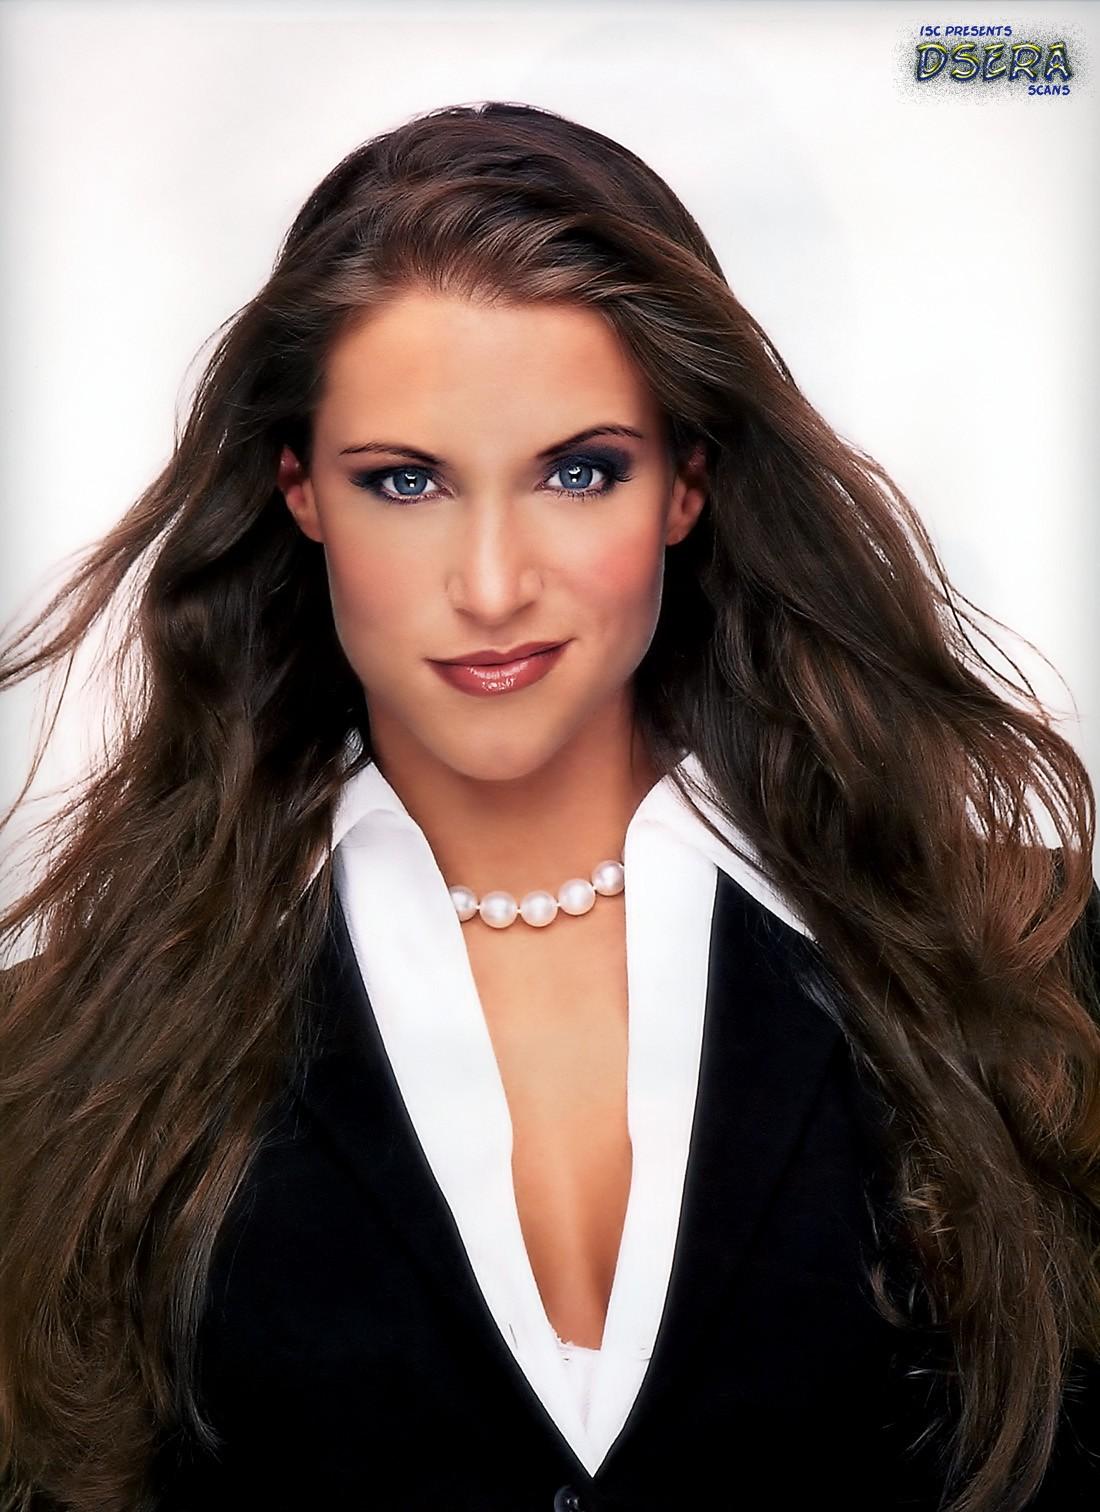 Wrestler Stephanie McMahon  - age: 41